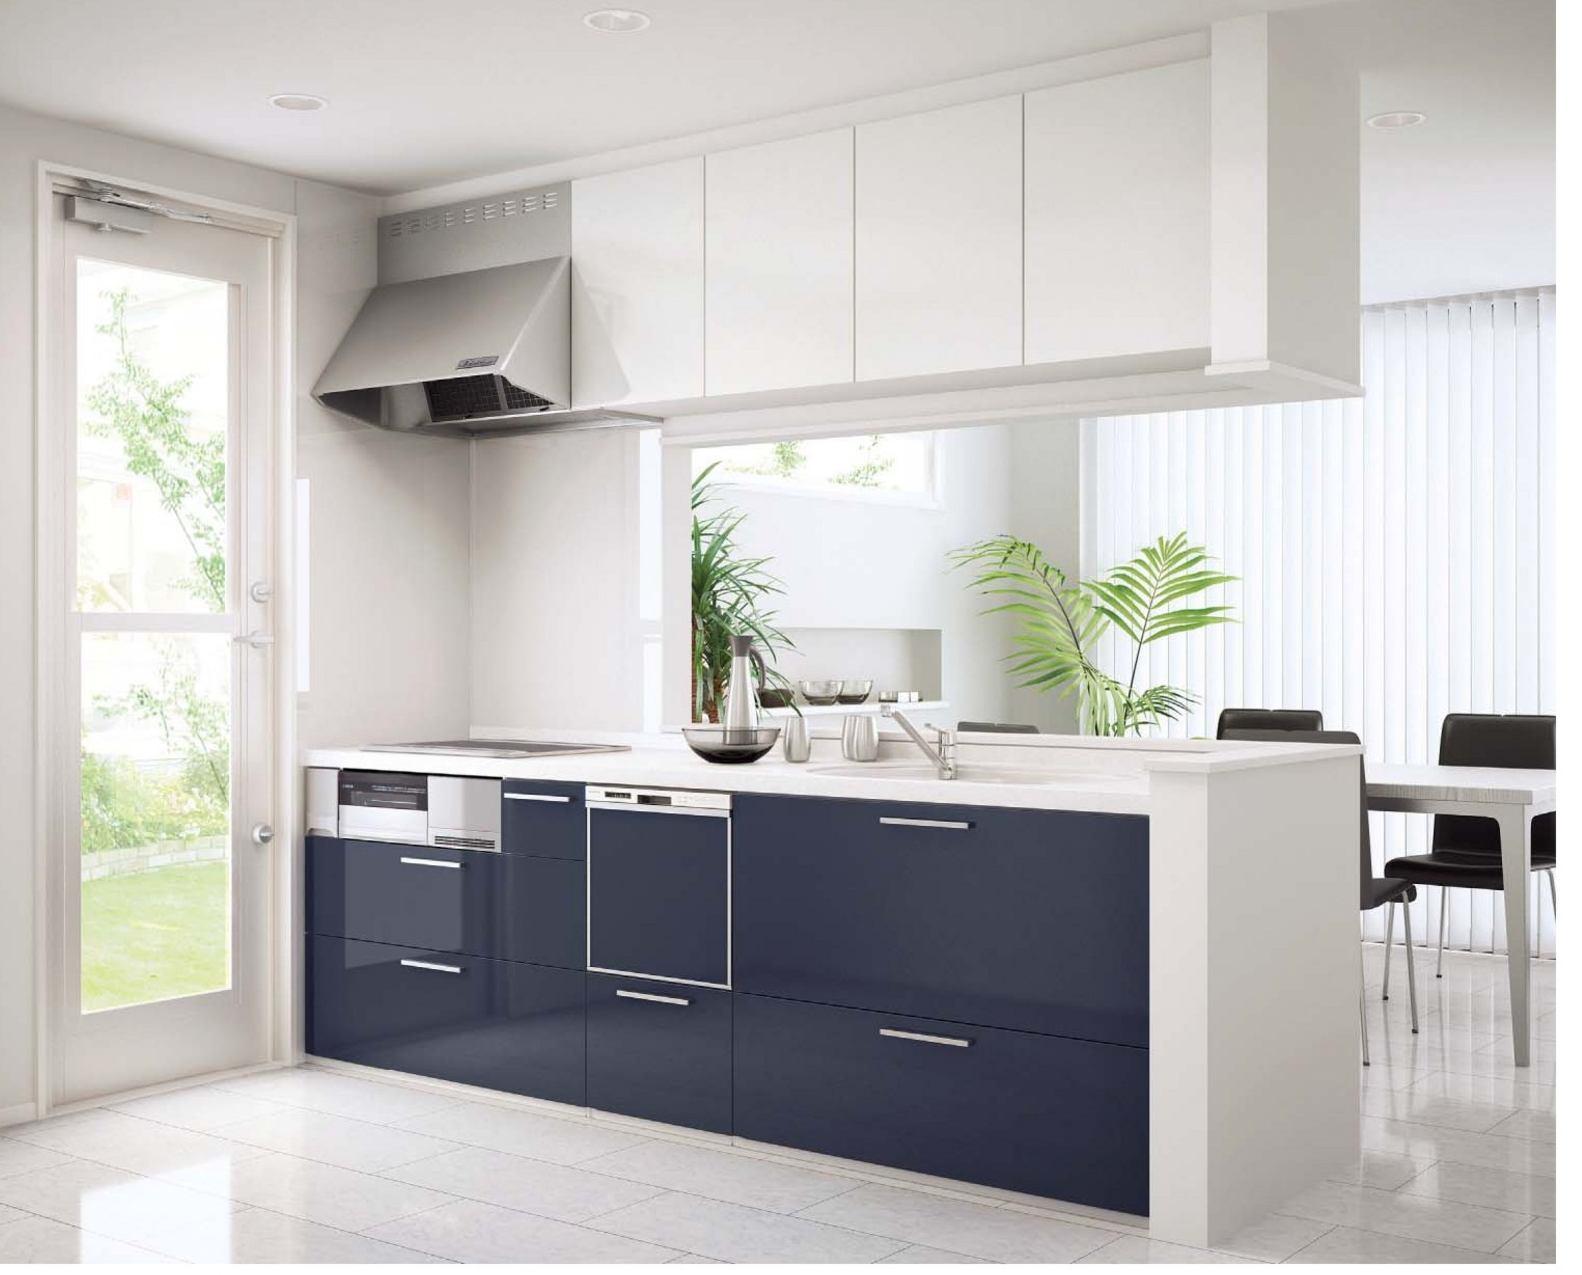 41 small kitchen design ideas small kitchen design White Small Kitchen Design